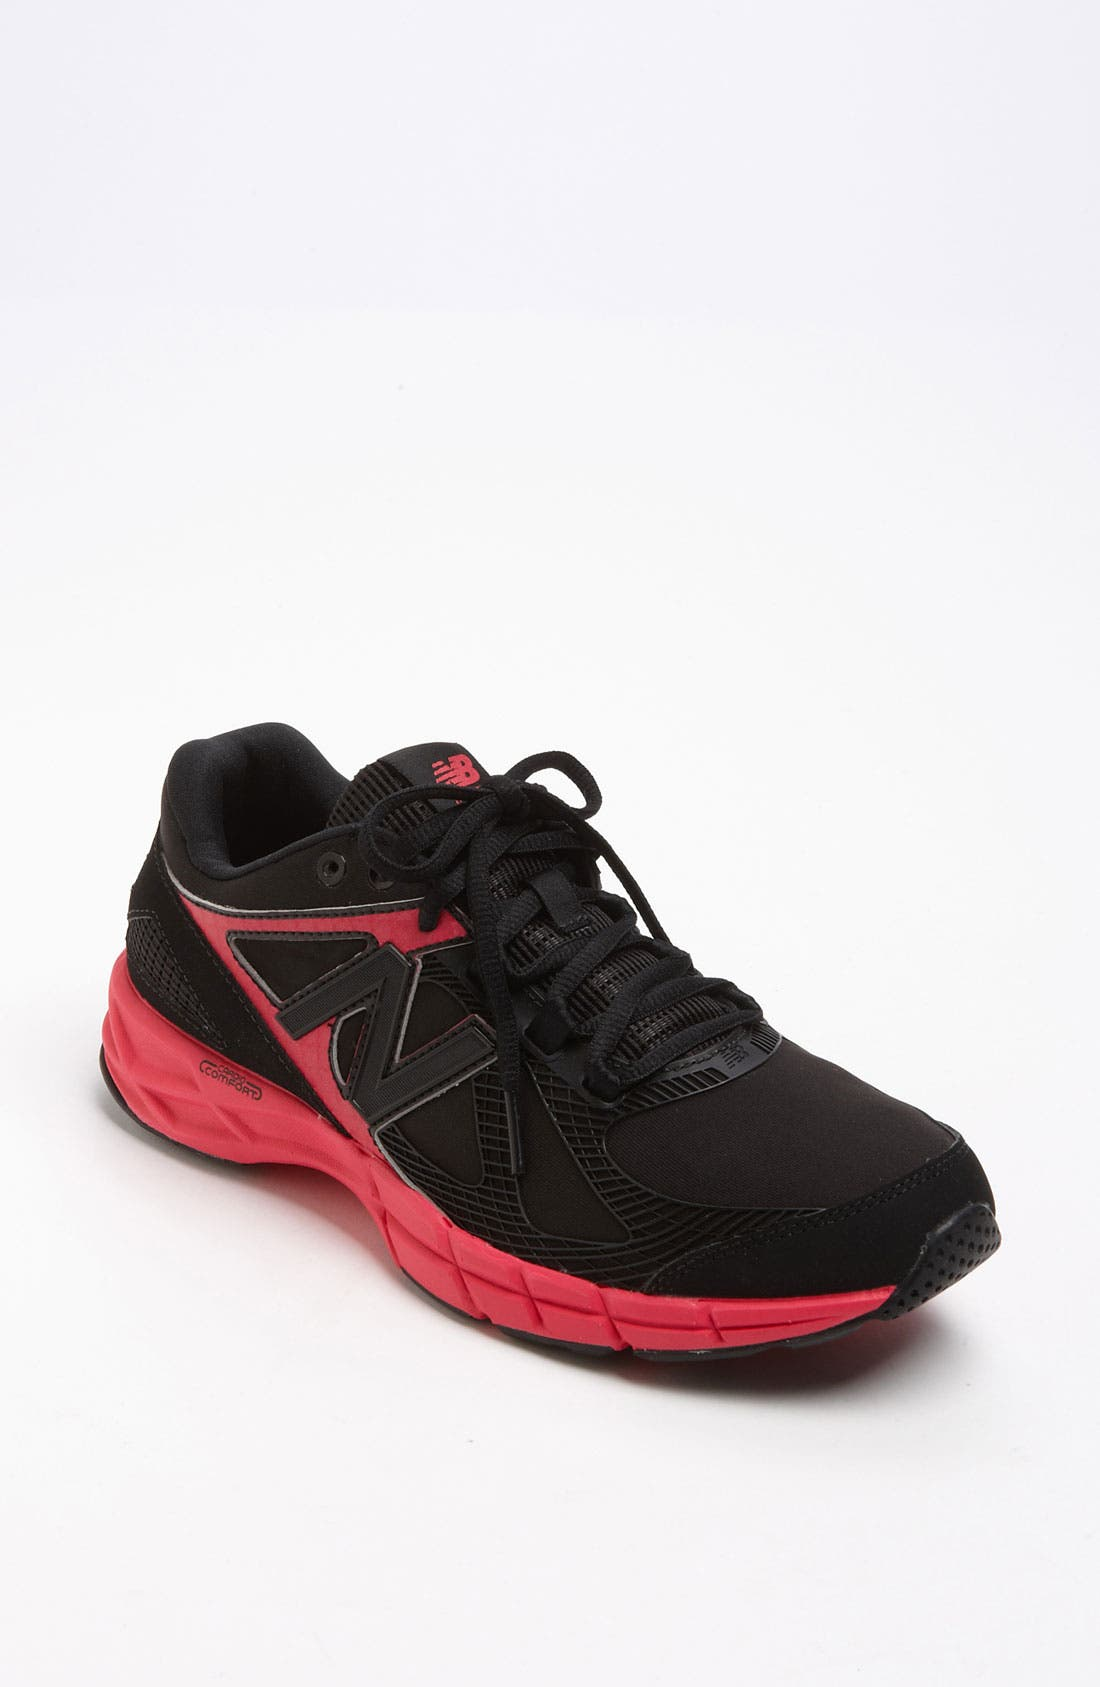 Main Image - New Balance '877' Training Shoe (Women)